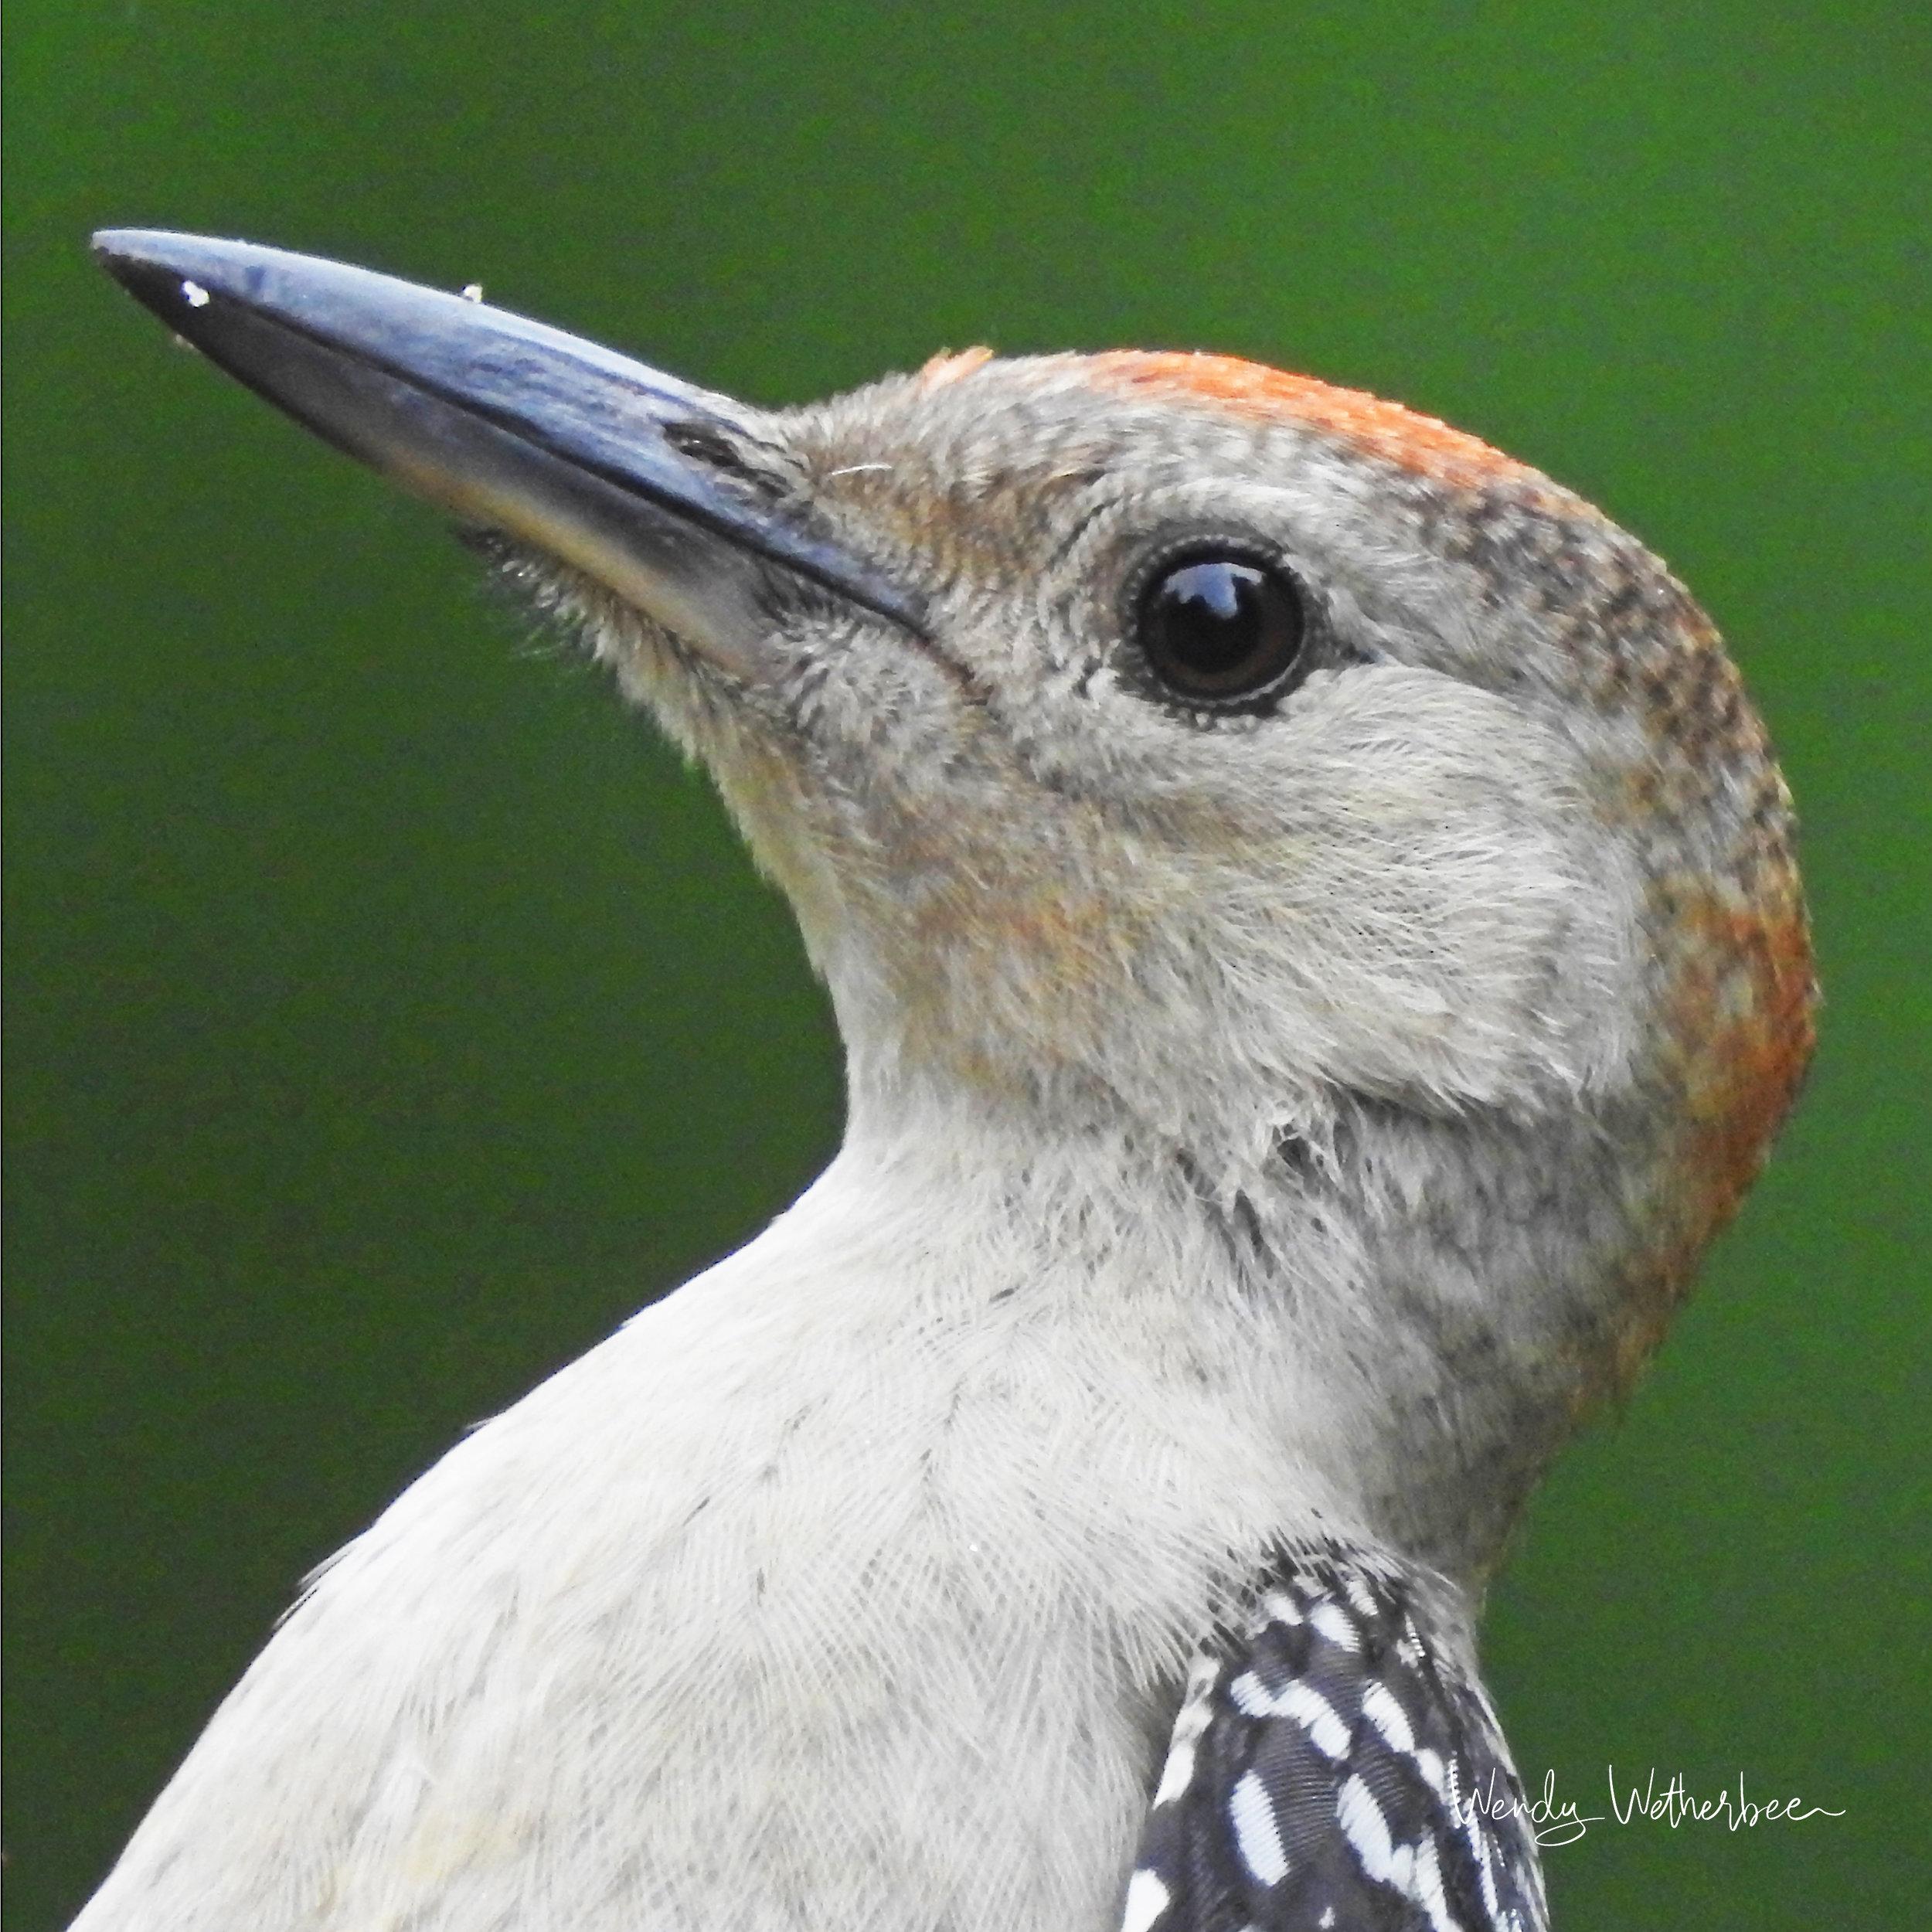 Portrait of a Red Bellied Woodpecker Fledgling © Wendy Wetherbee